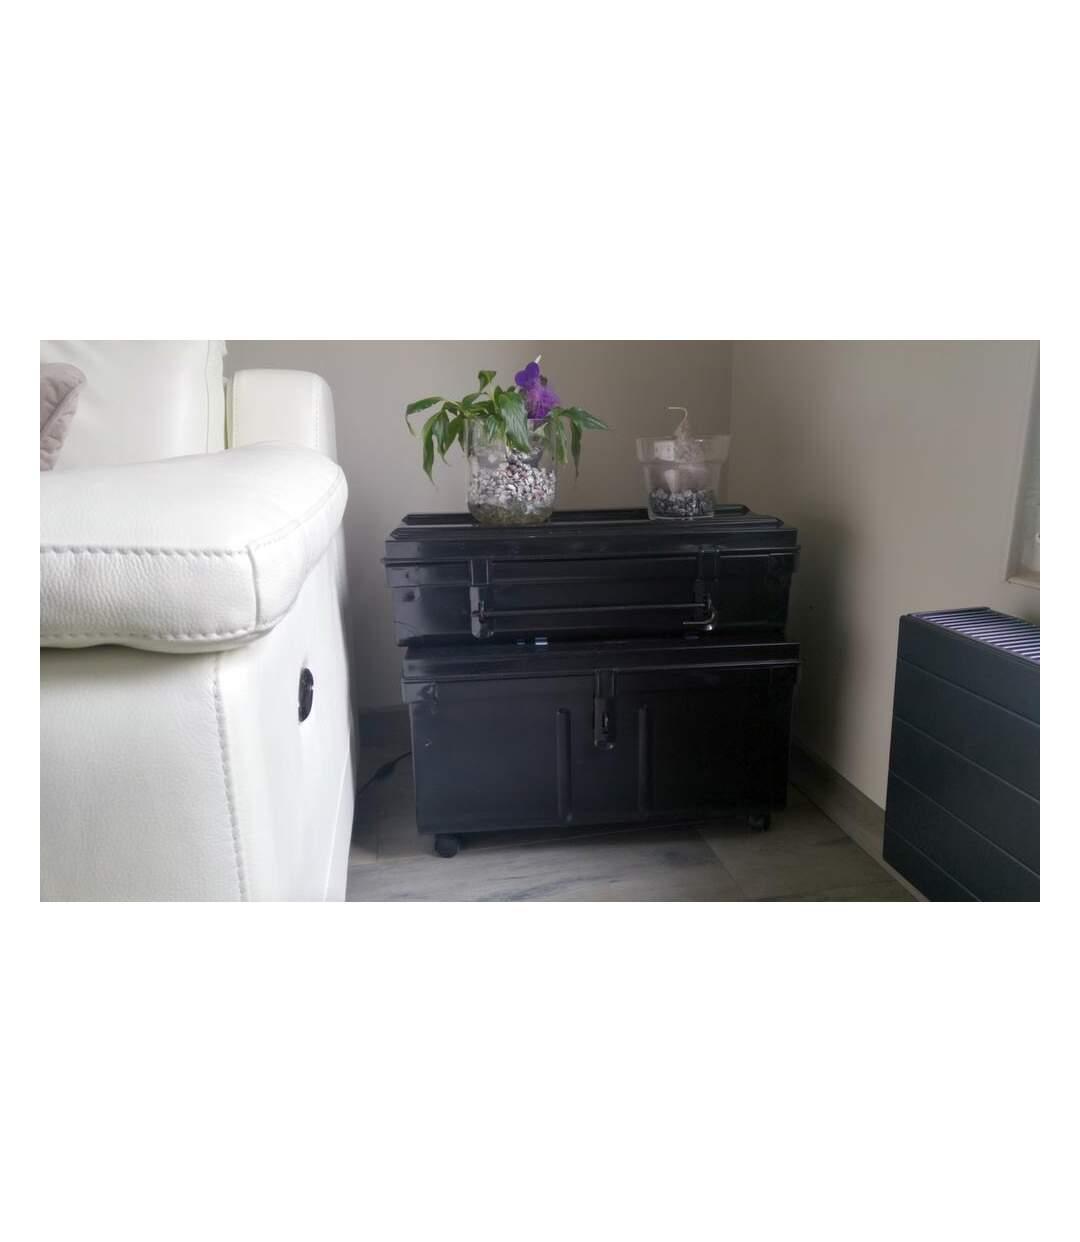 Coffre habitat en acier 60 litres